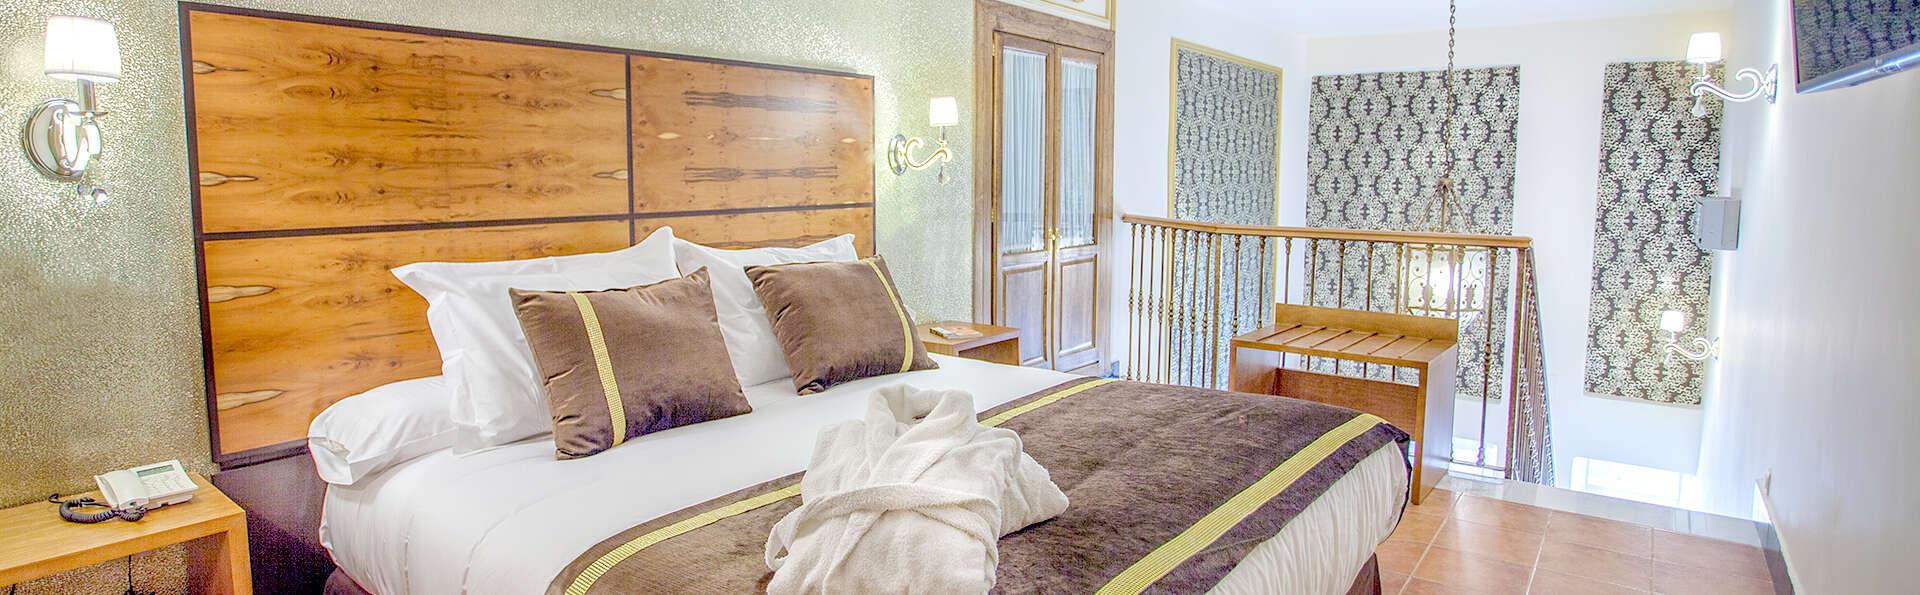 Hotel Rosaleda de Don Pedro - Edit_Room4.jpg